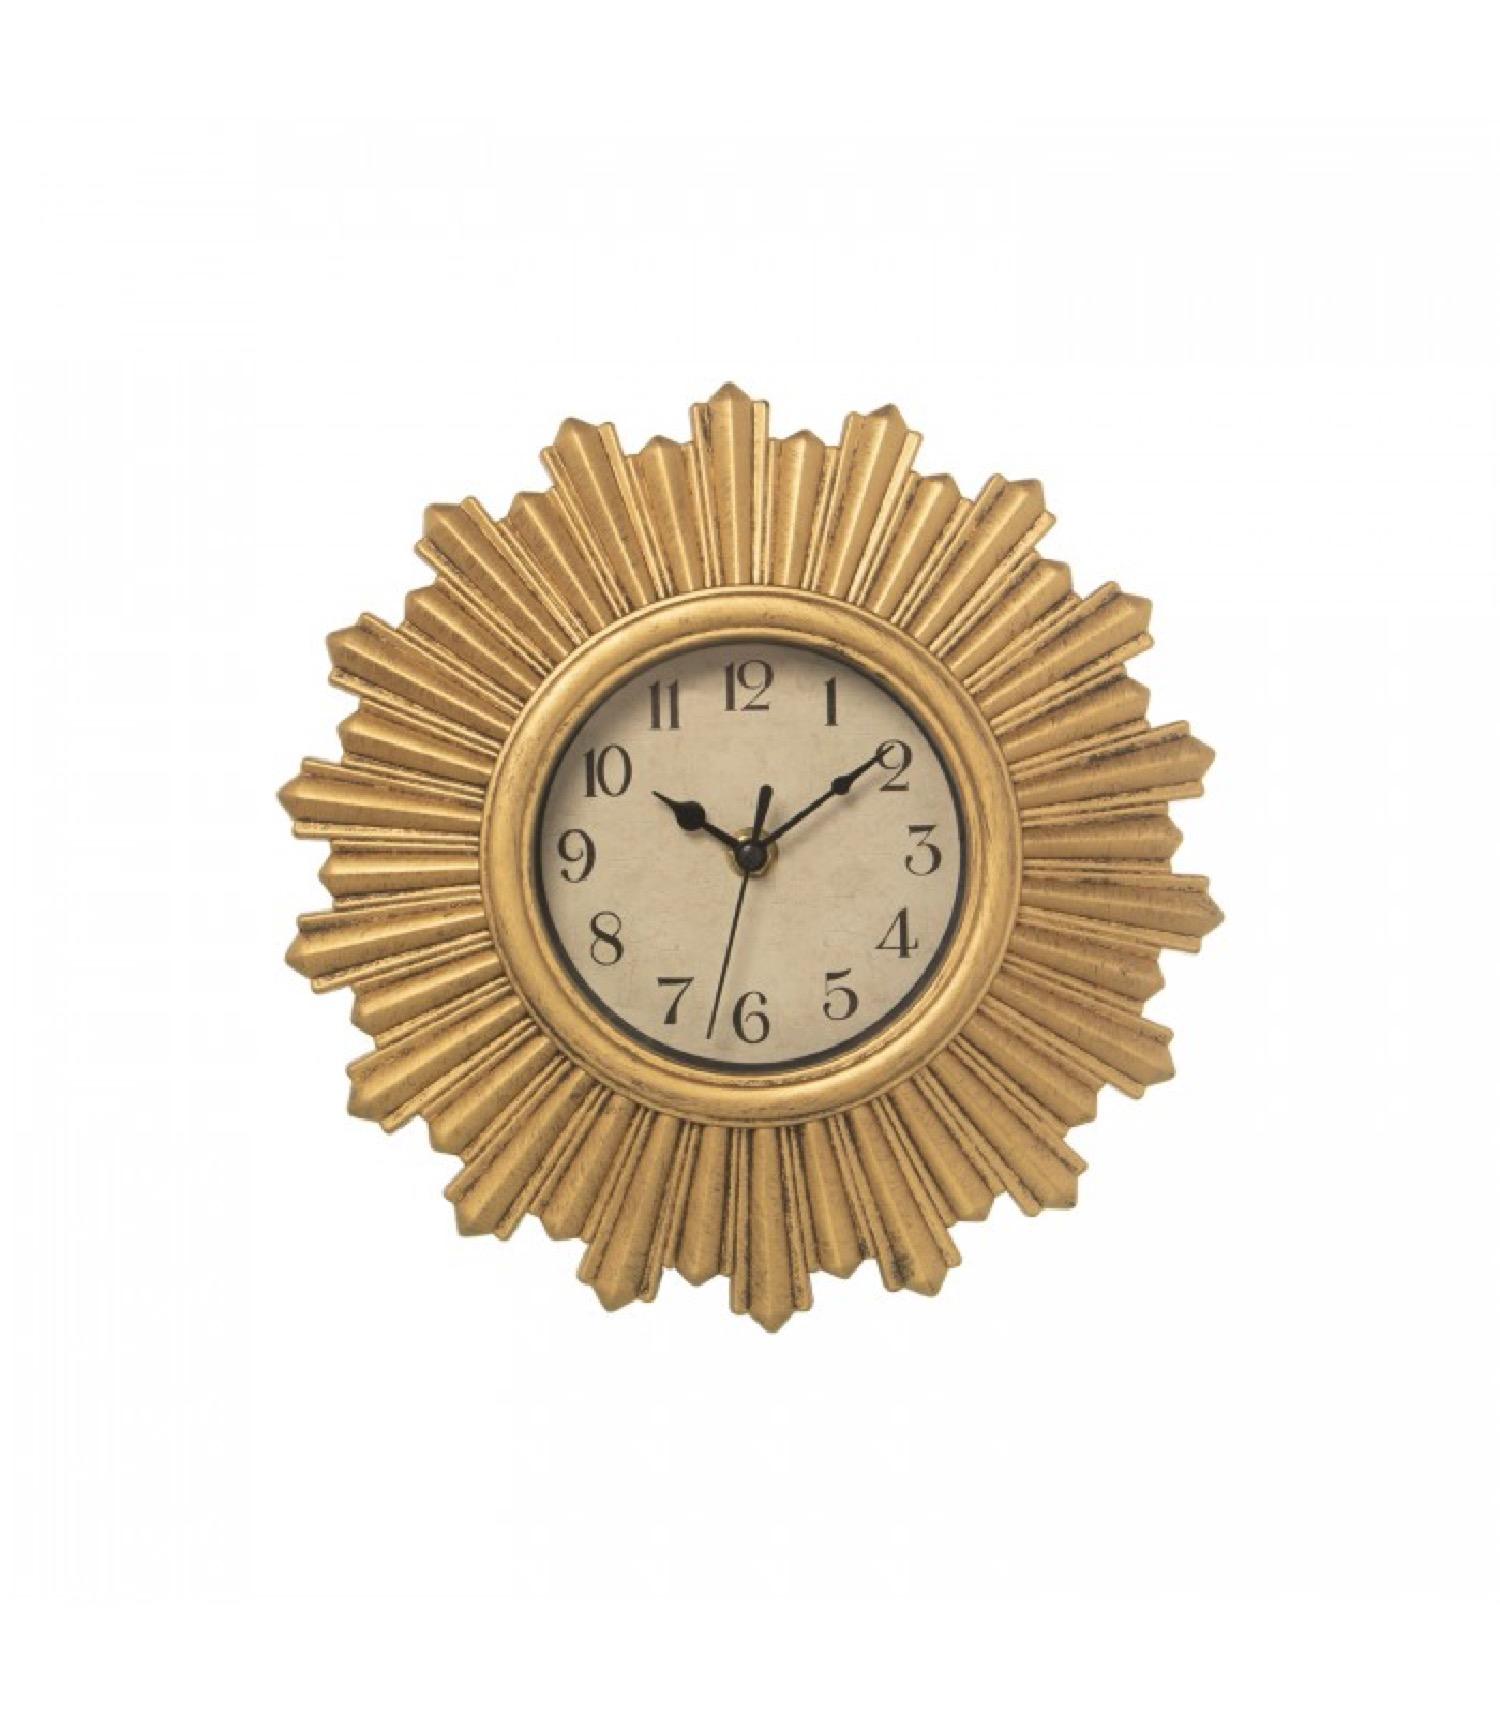 Horloge murale en résine dorée D30